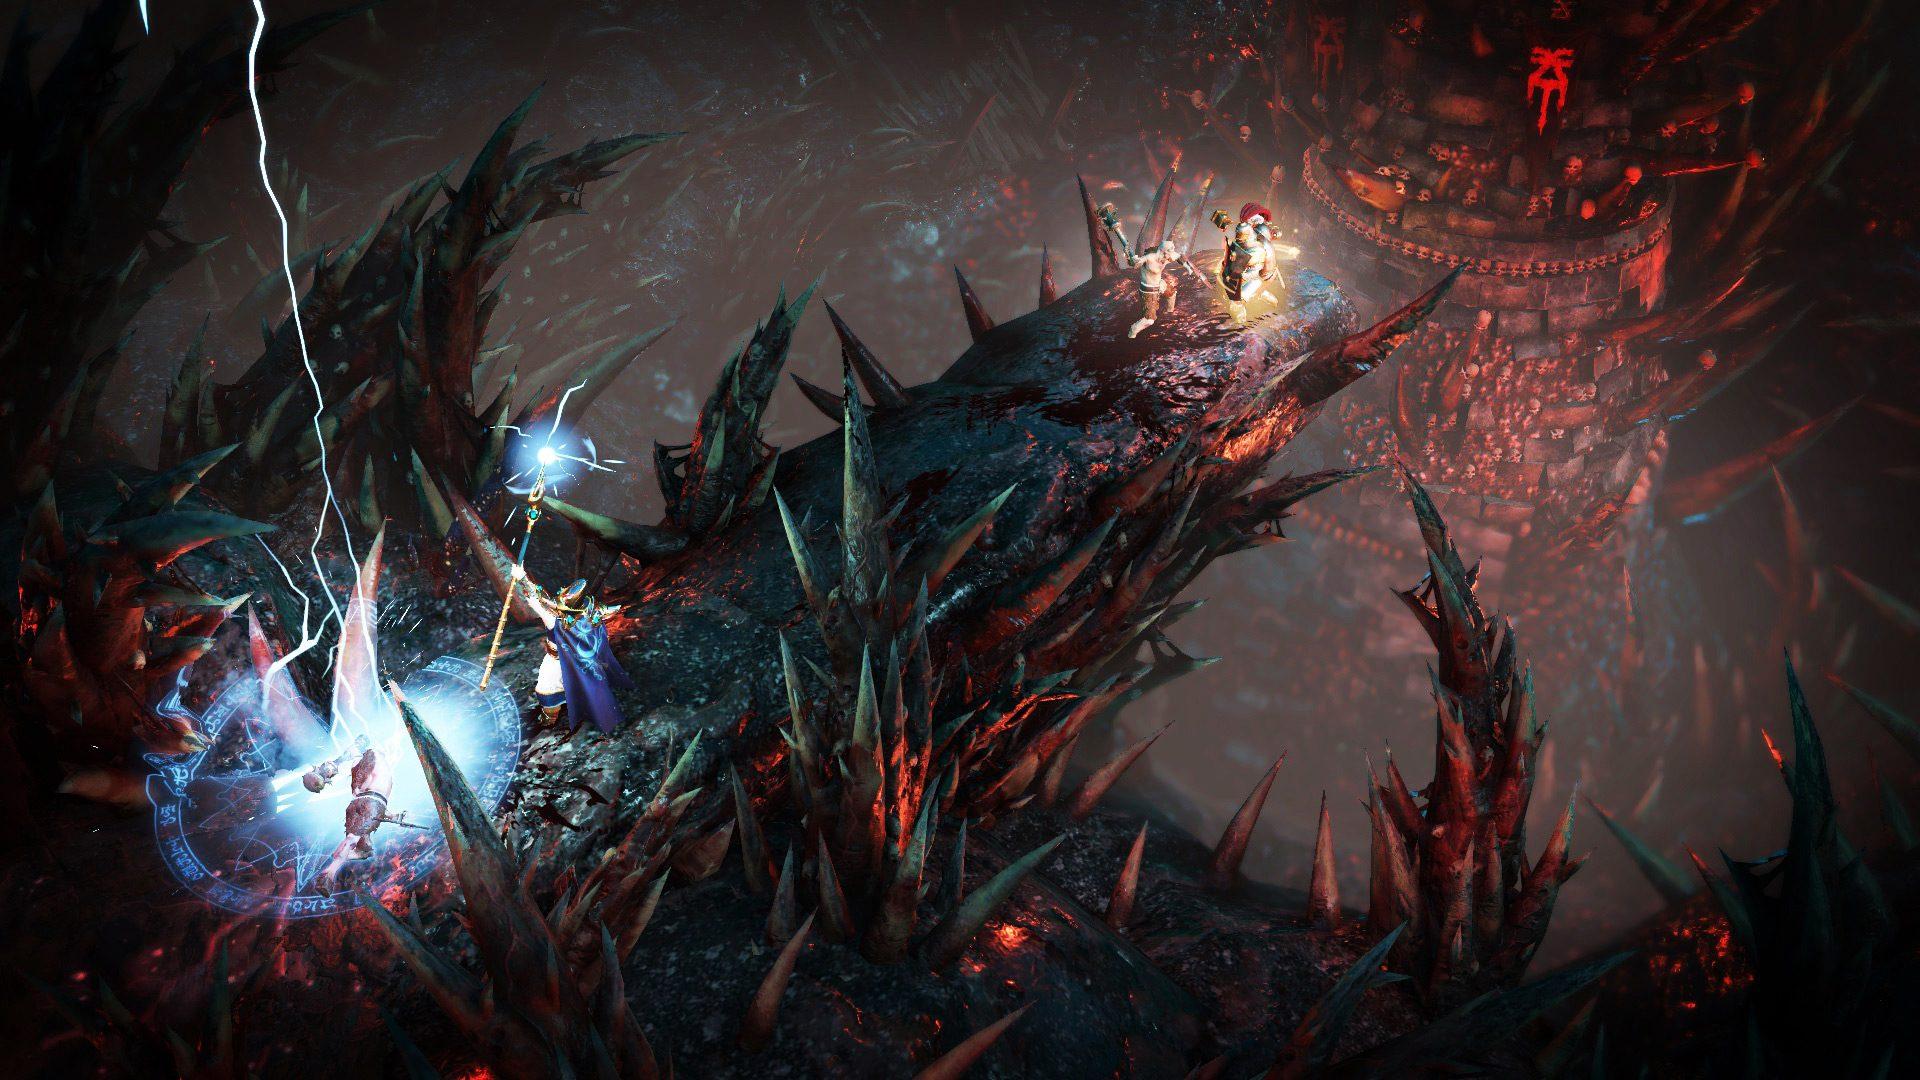 Summoning lightning in Warhammer: Chaosbane